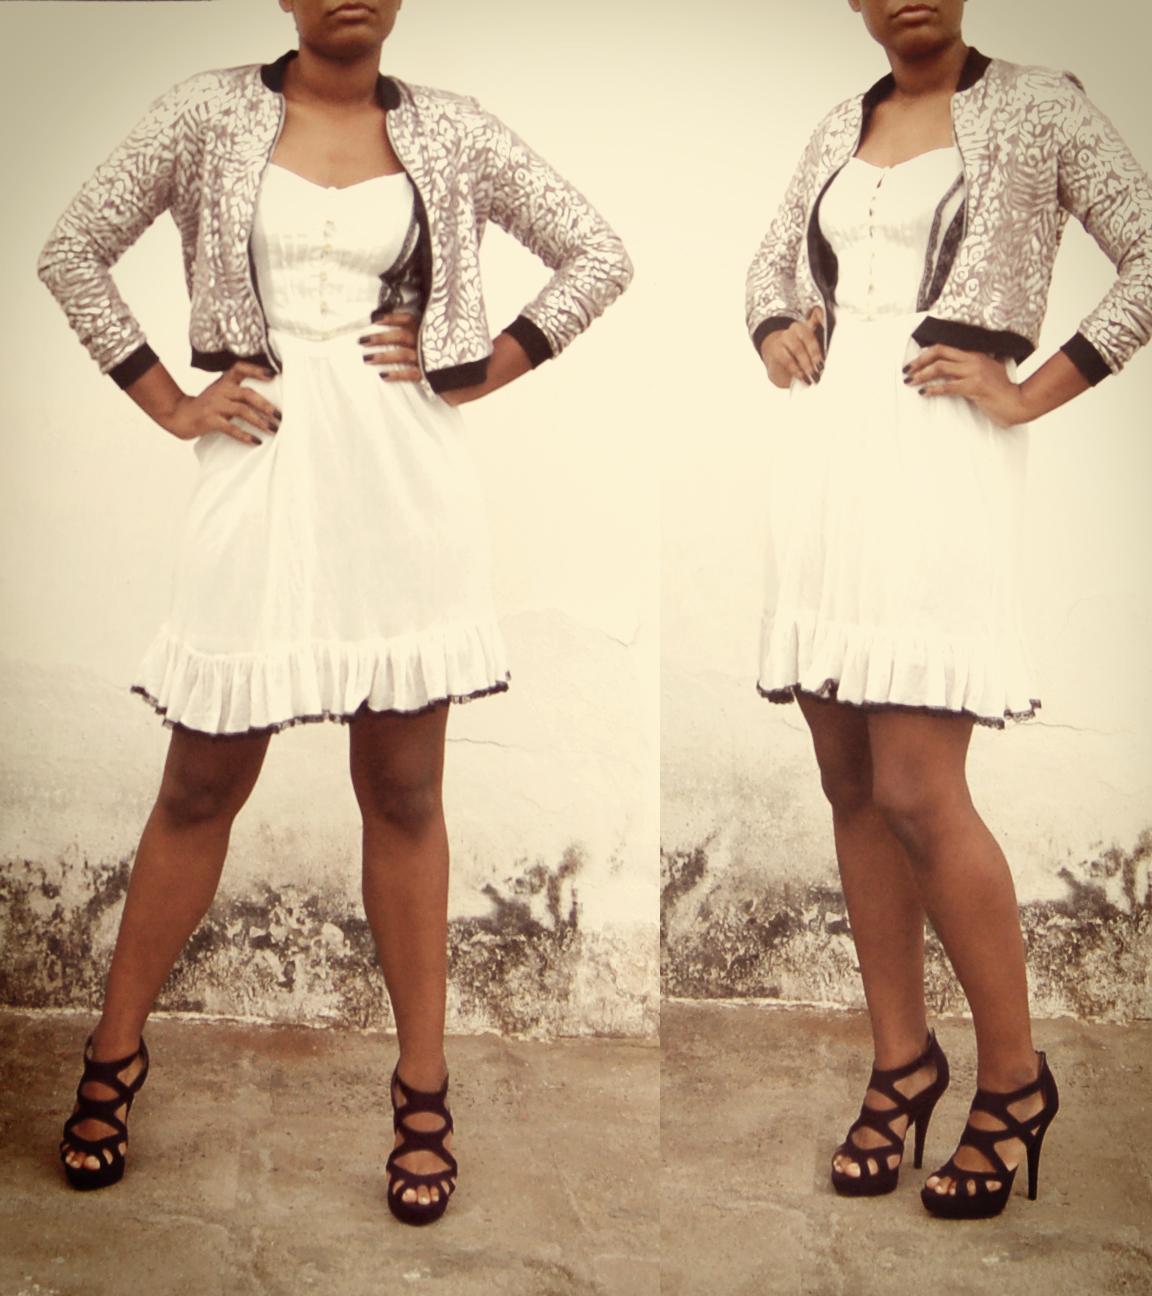 Jacket, Asos; Dress, Mango; Shoes; New Look. // Jaqueta, Asos; Vestido, Mango; Sapatos; New Look.